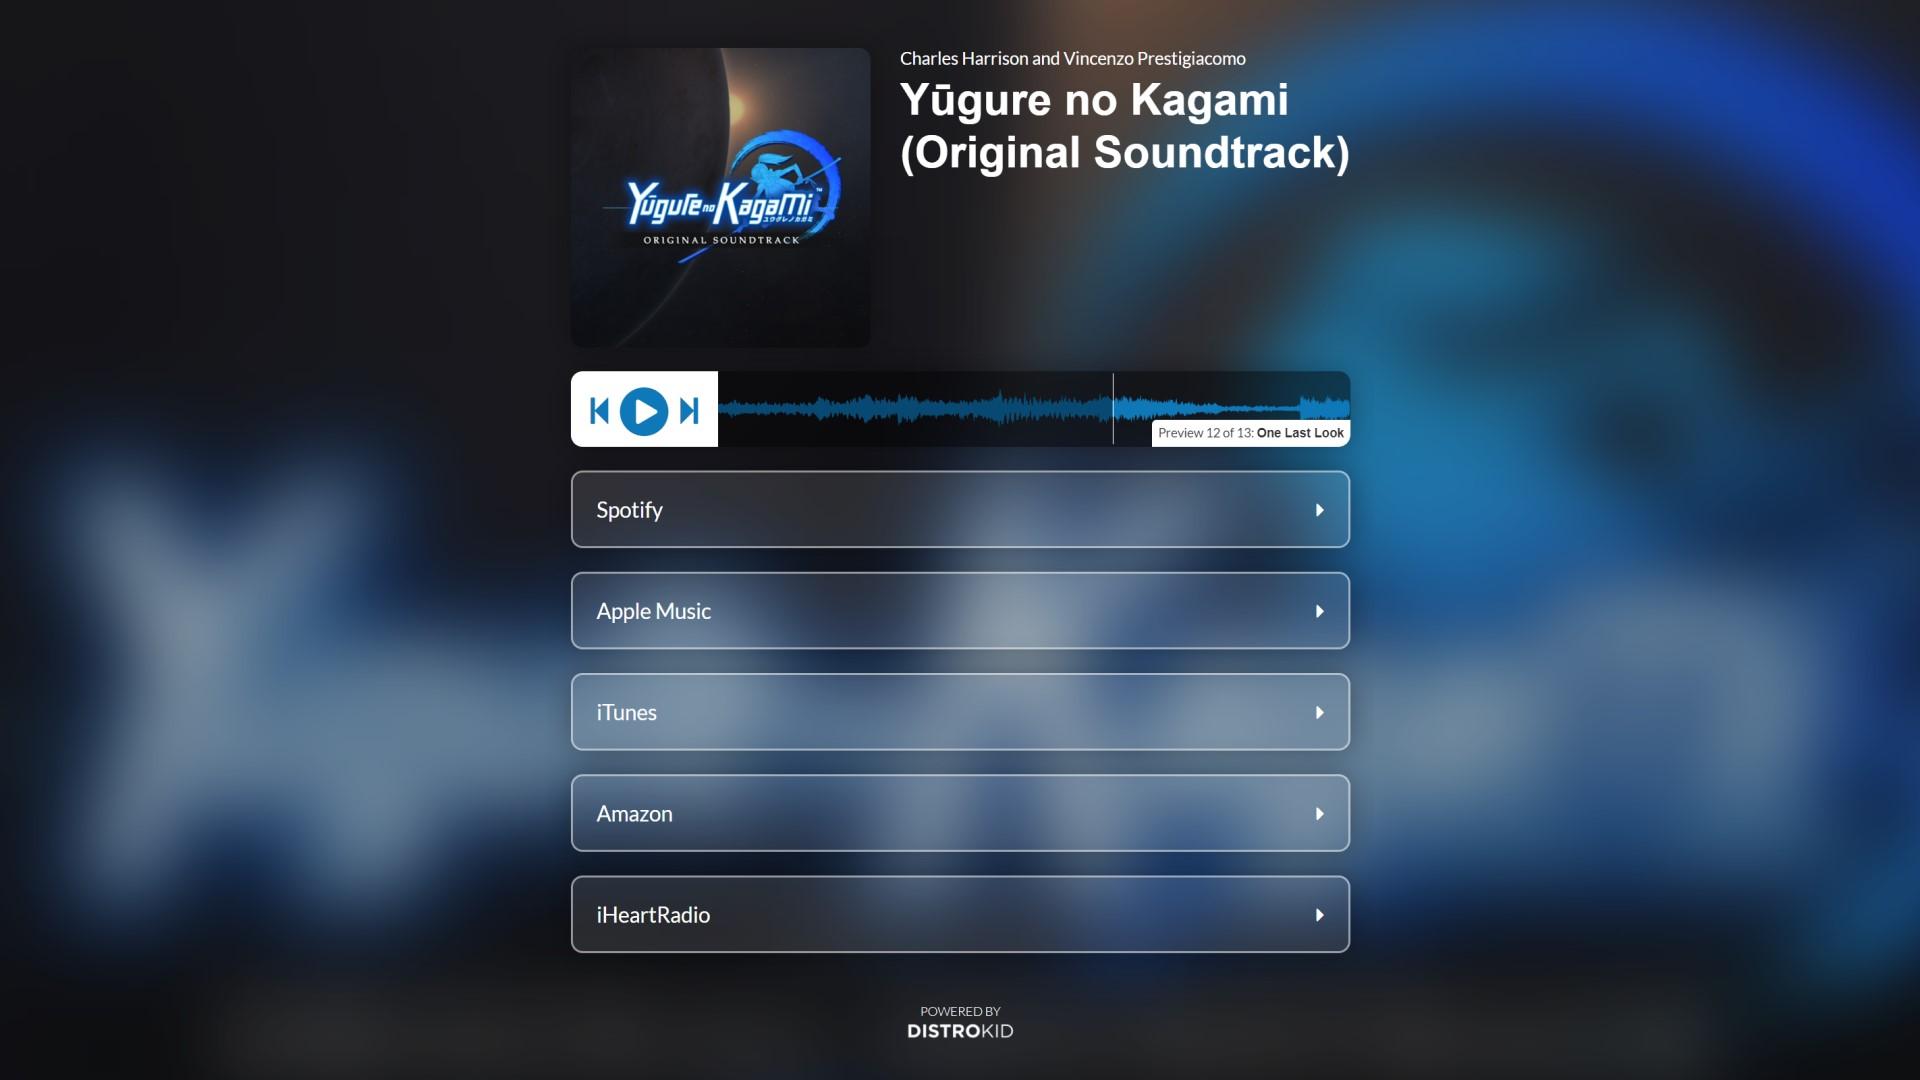 Yugure no Kagami Original Soundtrack on DistroKid